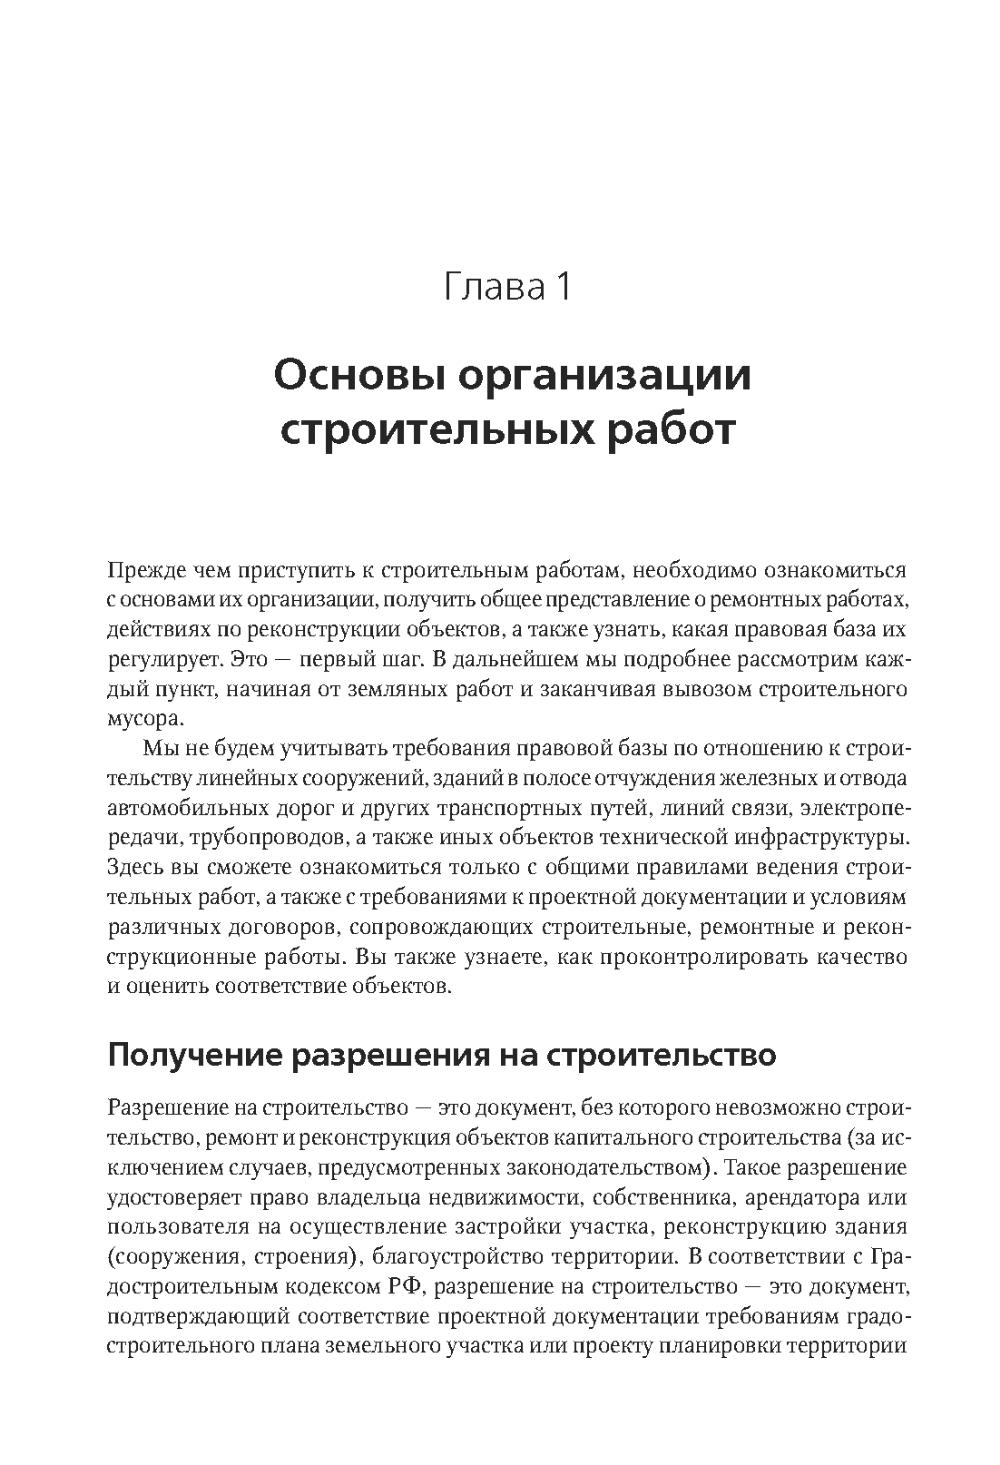 http://i2.imageban.ru/out/2013/11/04/a2ff19d224ee696dd5873f426d522d34.jpg